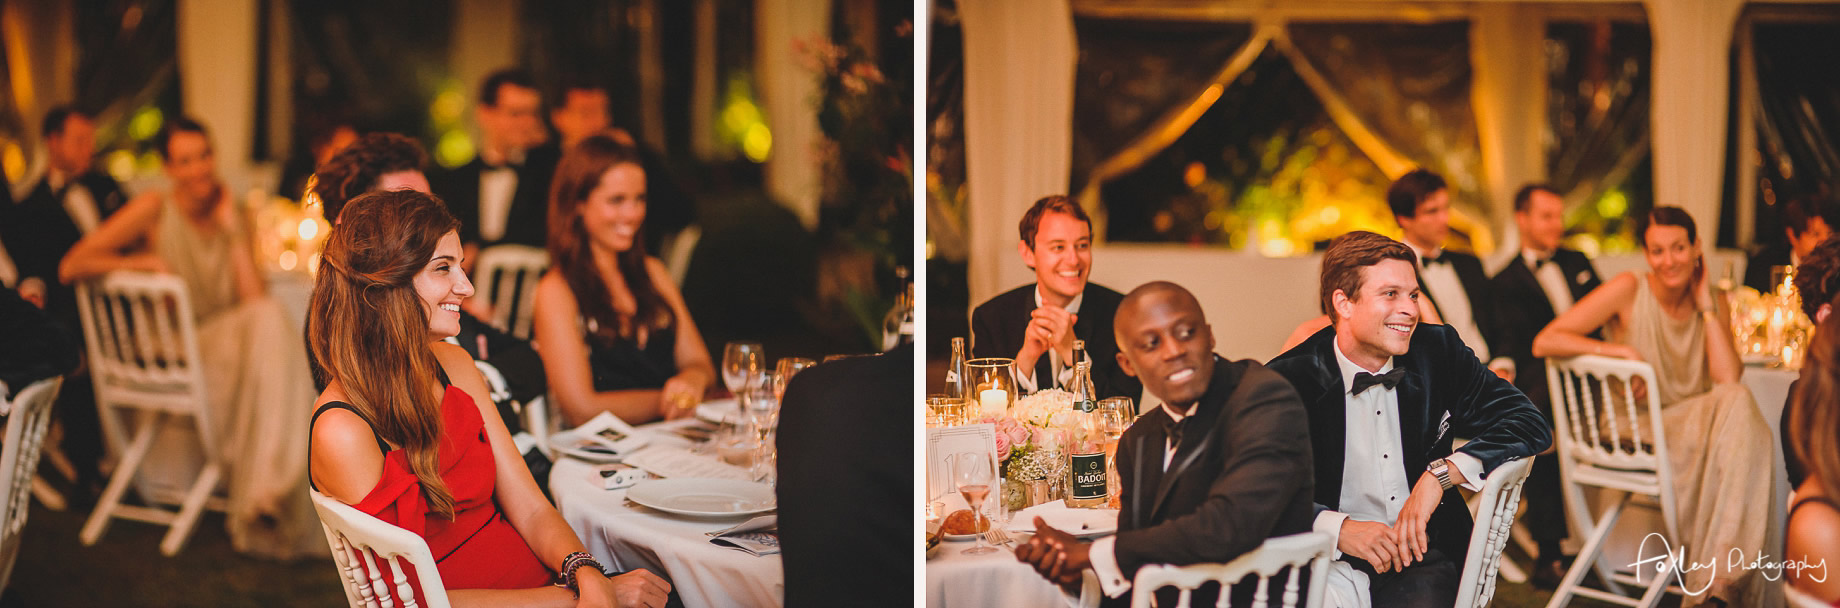 Jil and Will's Wedding at Villa Ephrussi De Rothschild 207